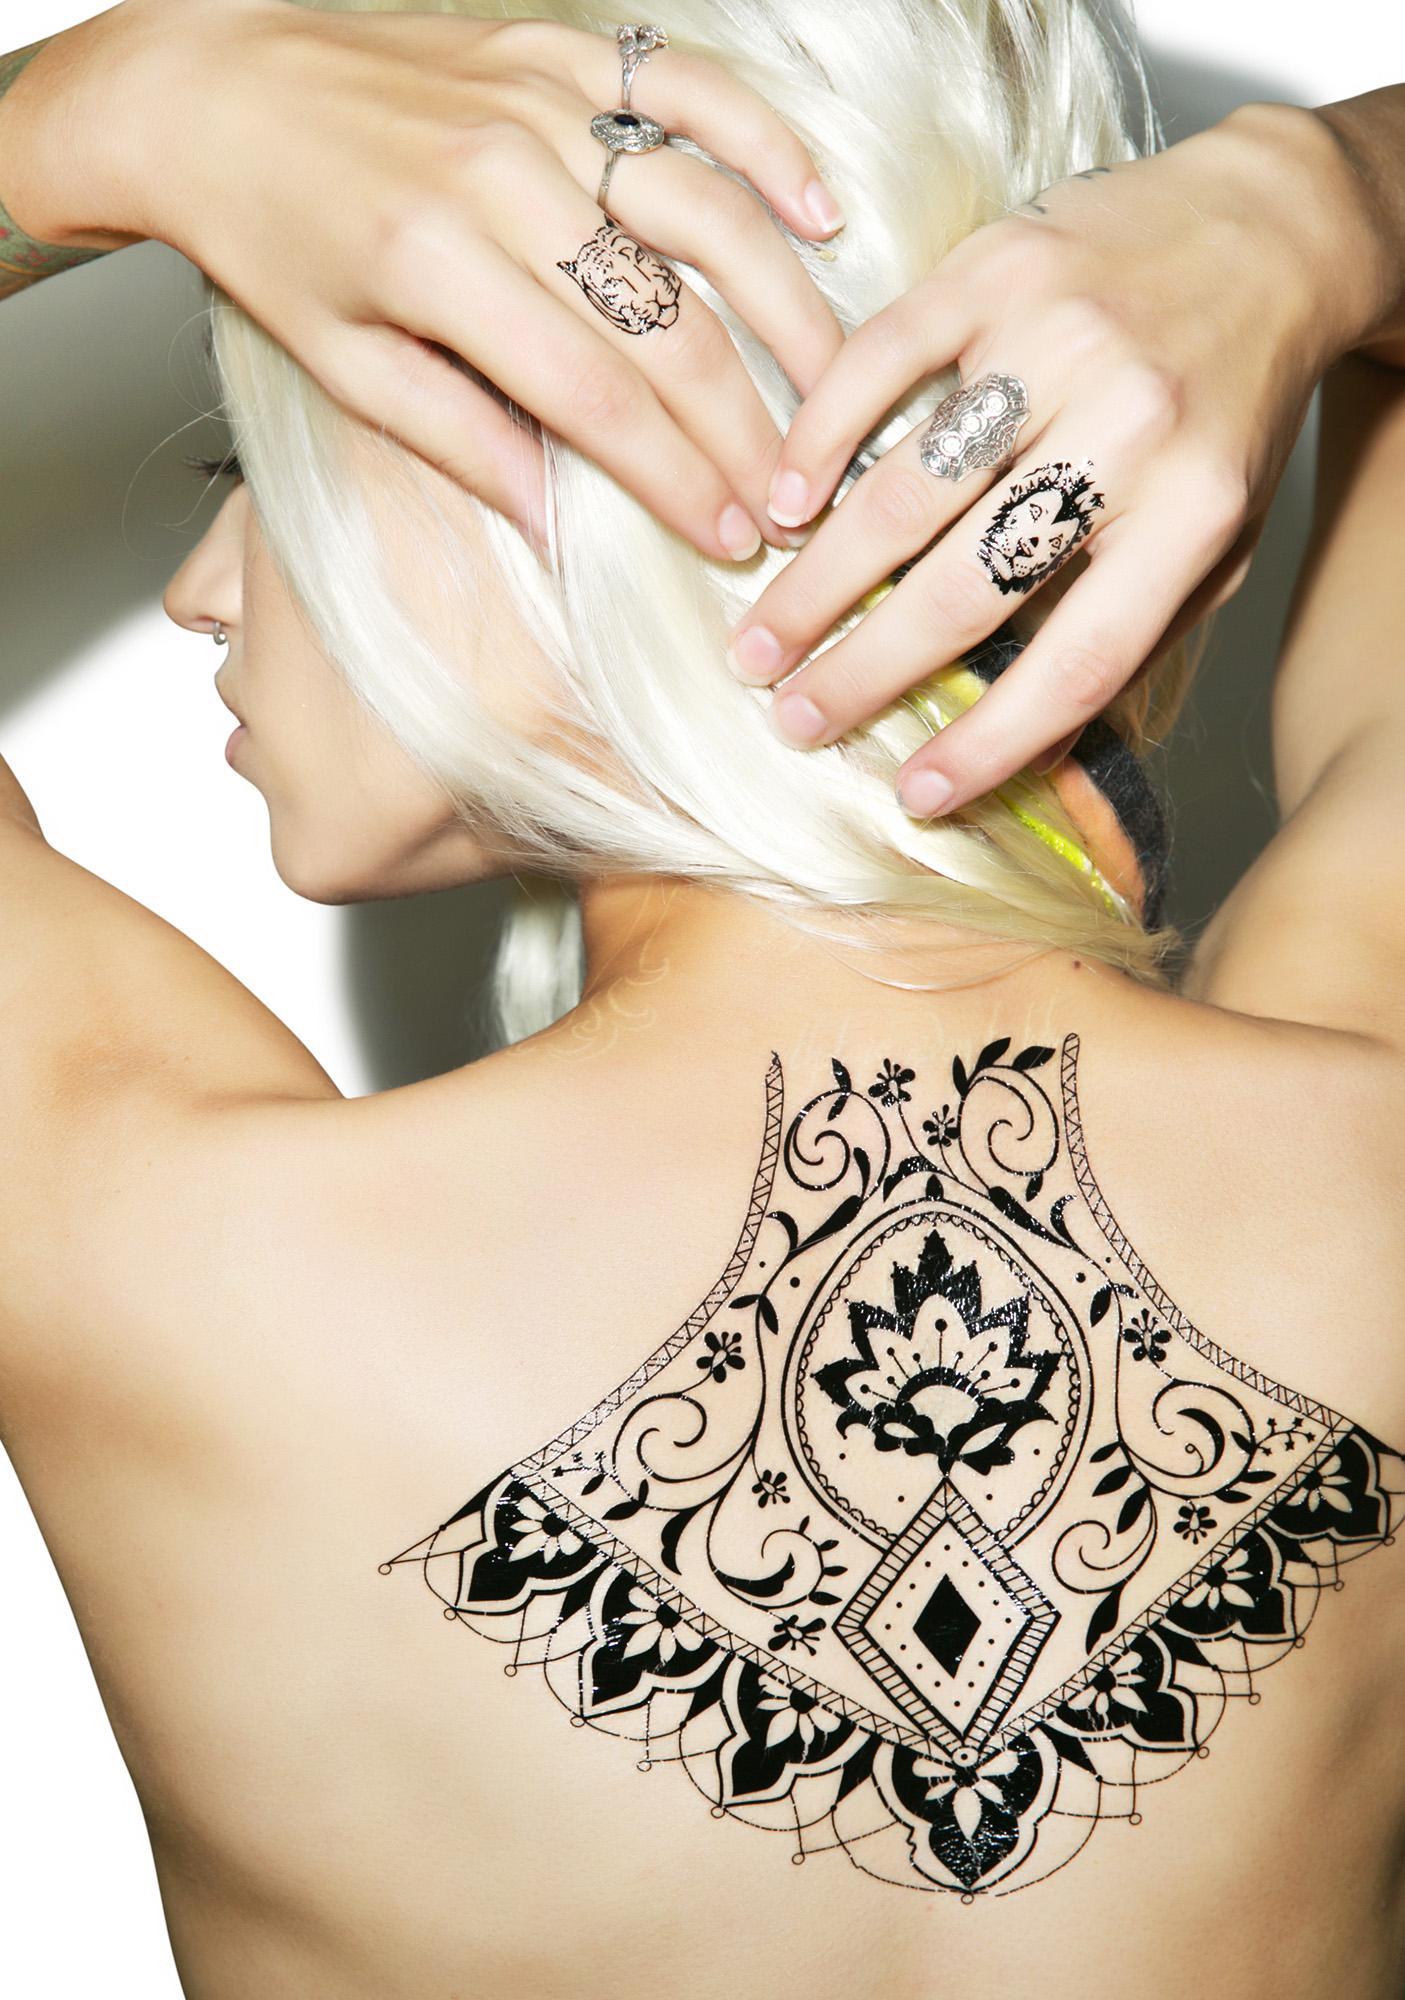 Primal Instincts Temporary Tattoos